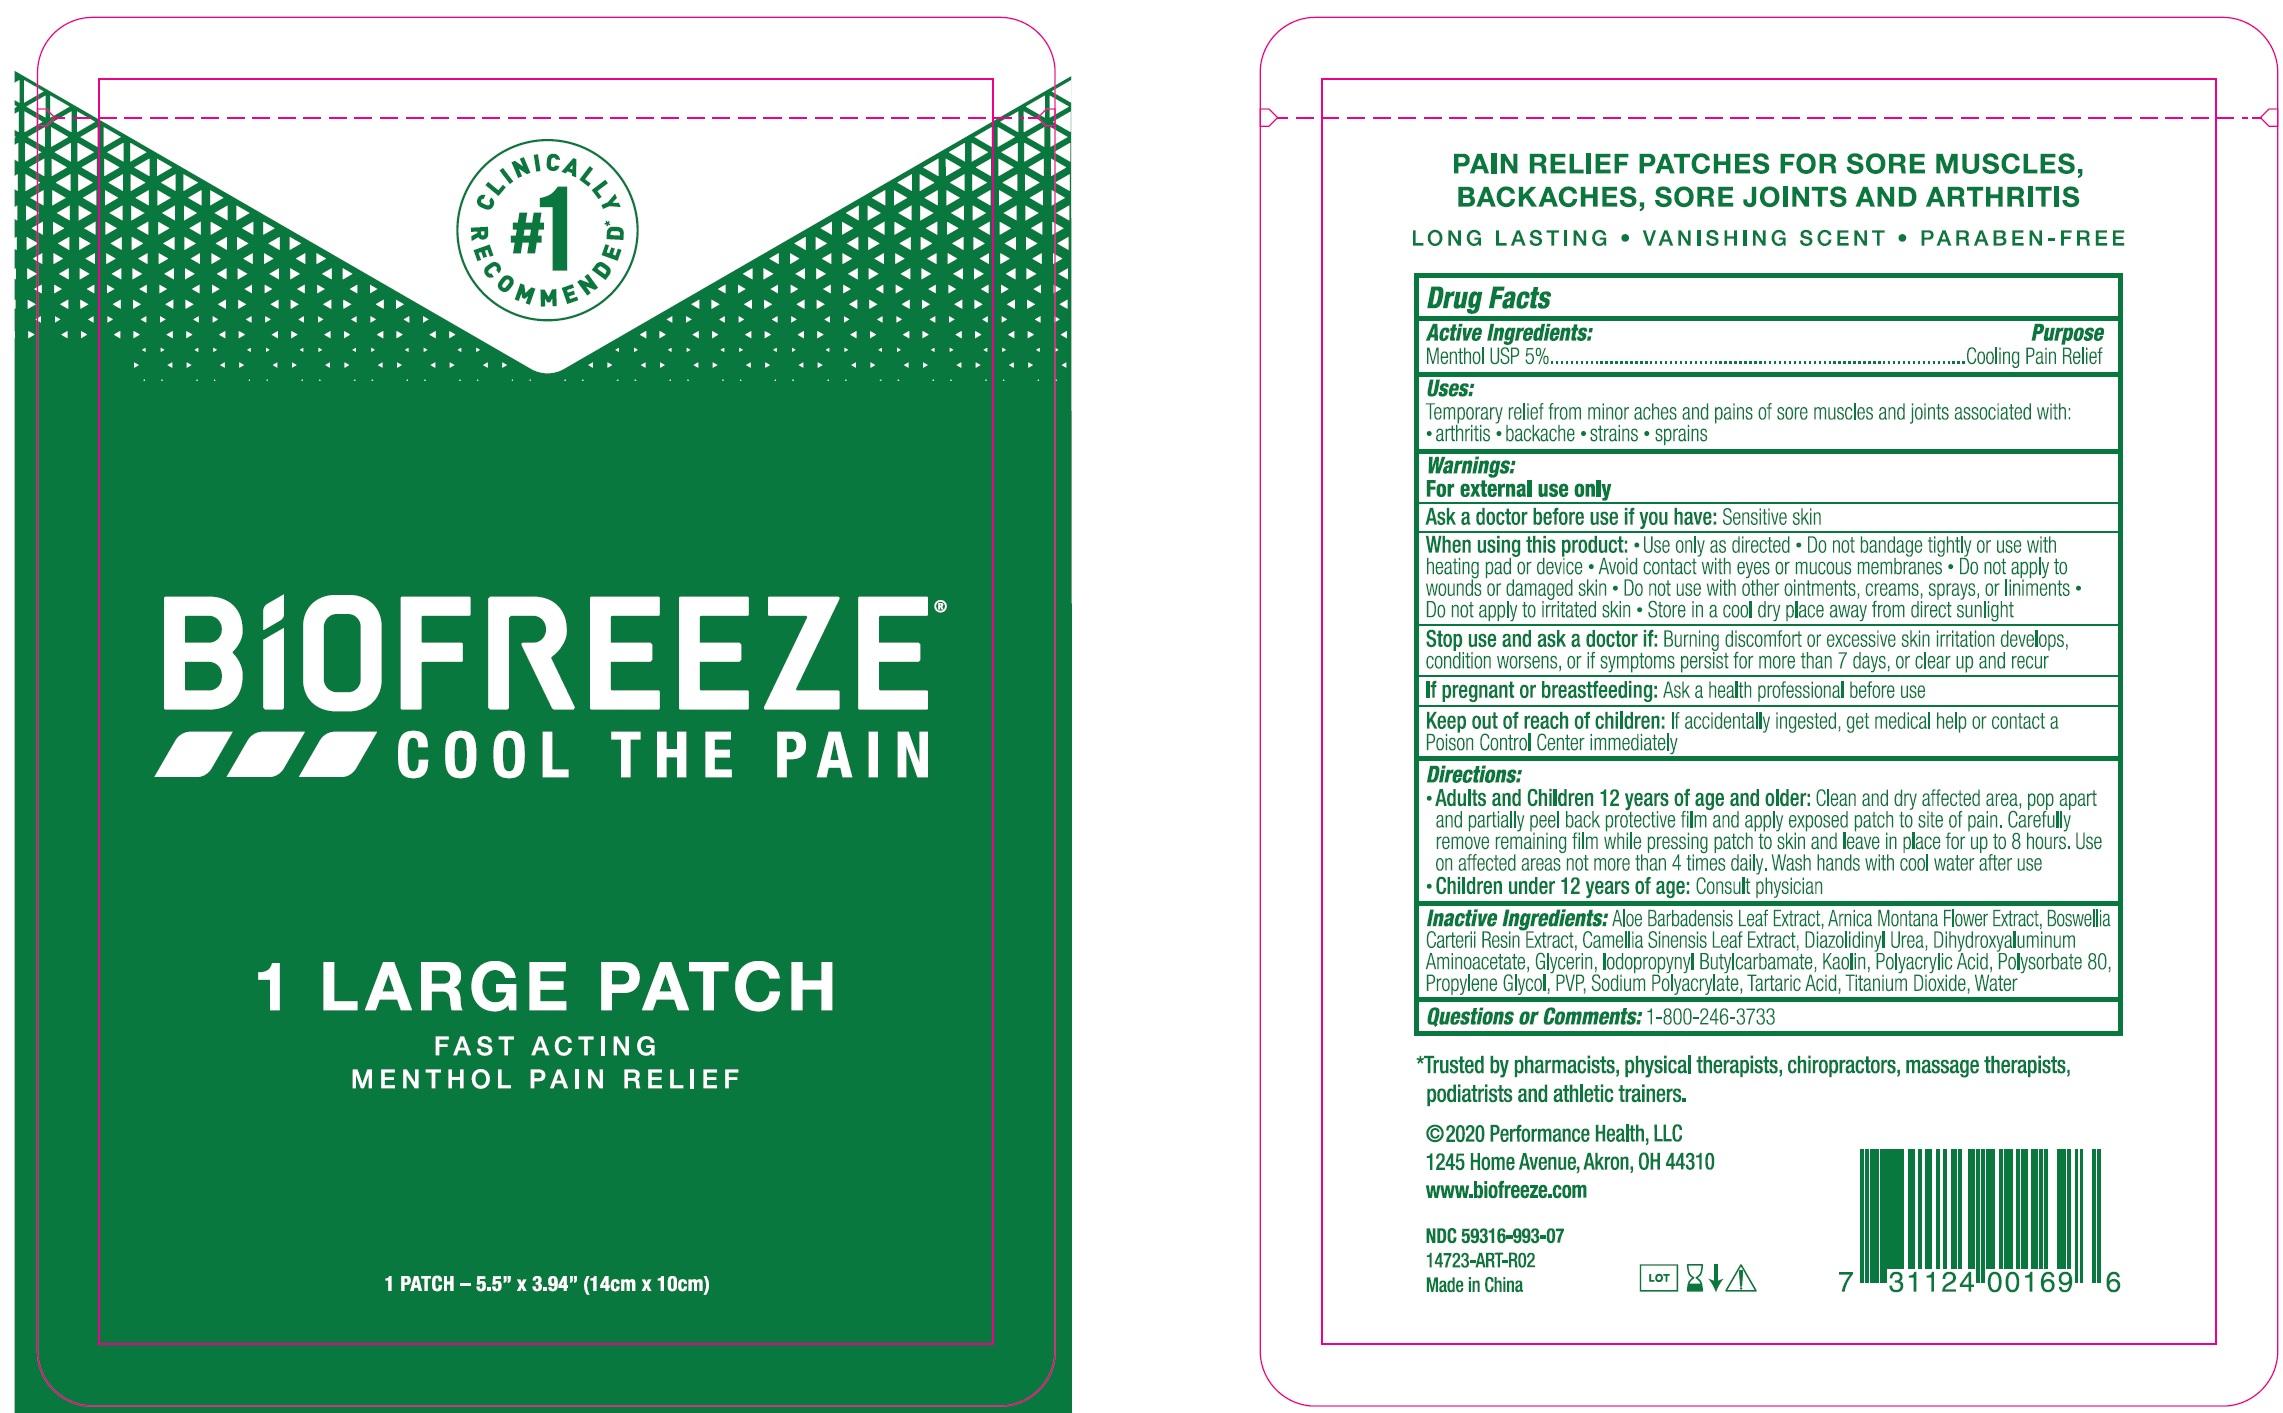 BIOFREEZE- menthol patch